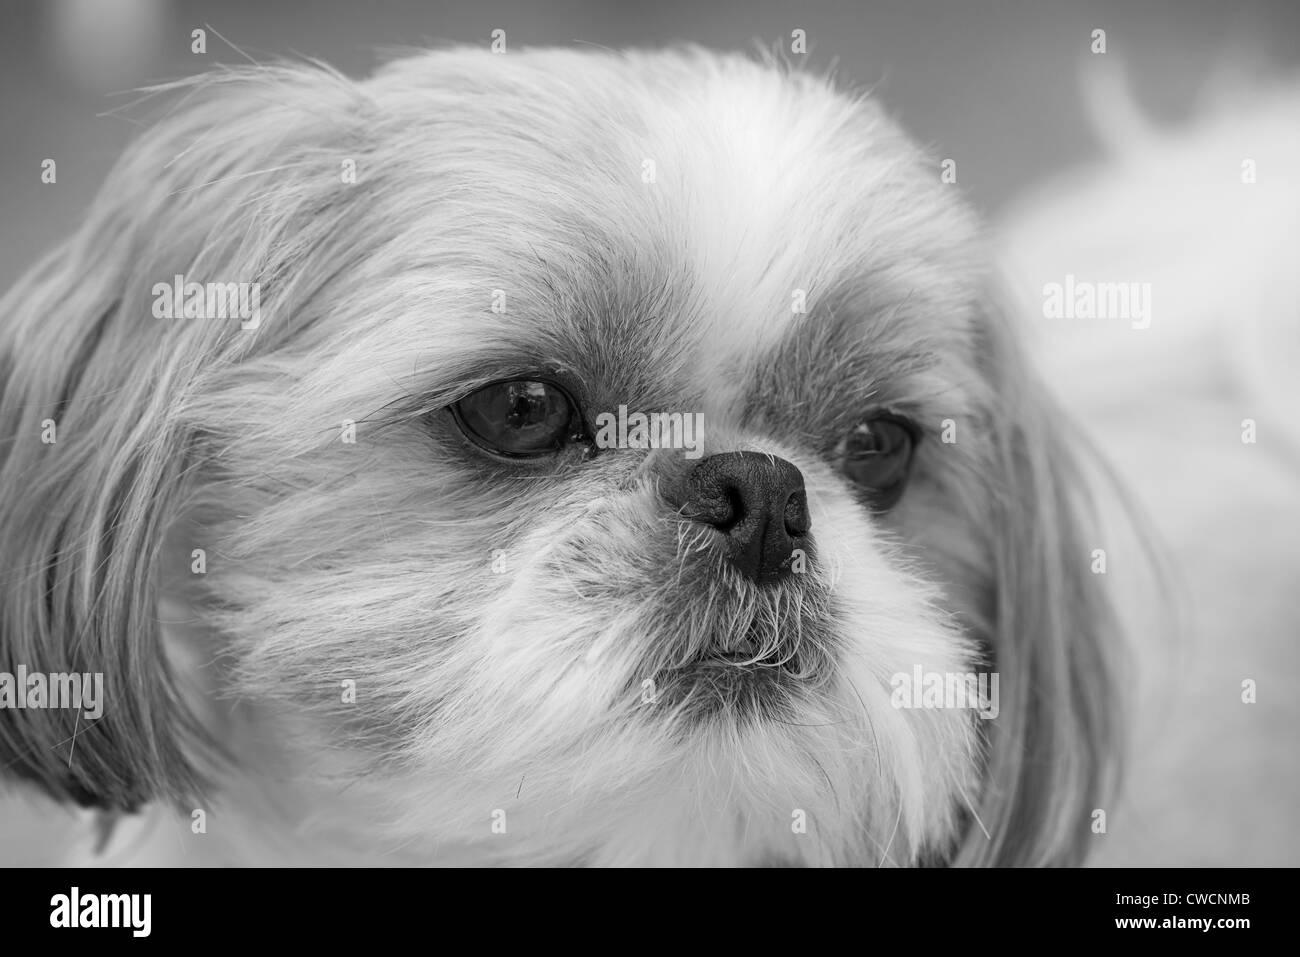 Tzu Black and White Stock Photos & Images - Alamy